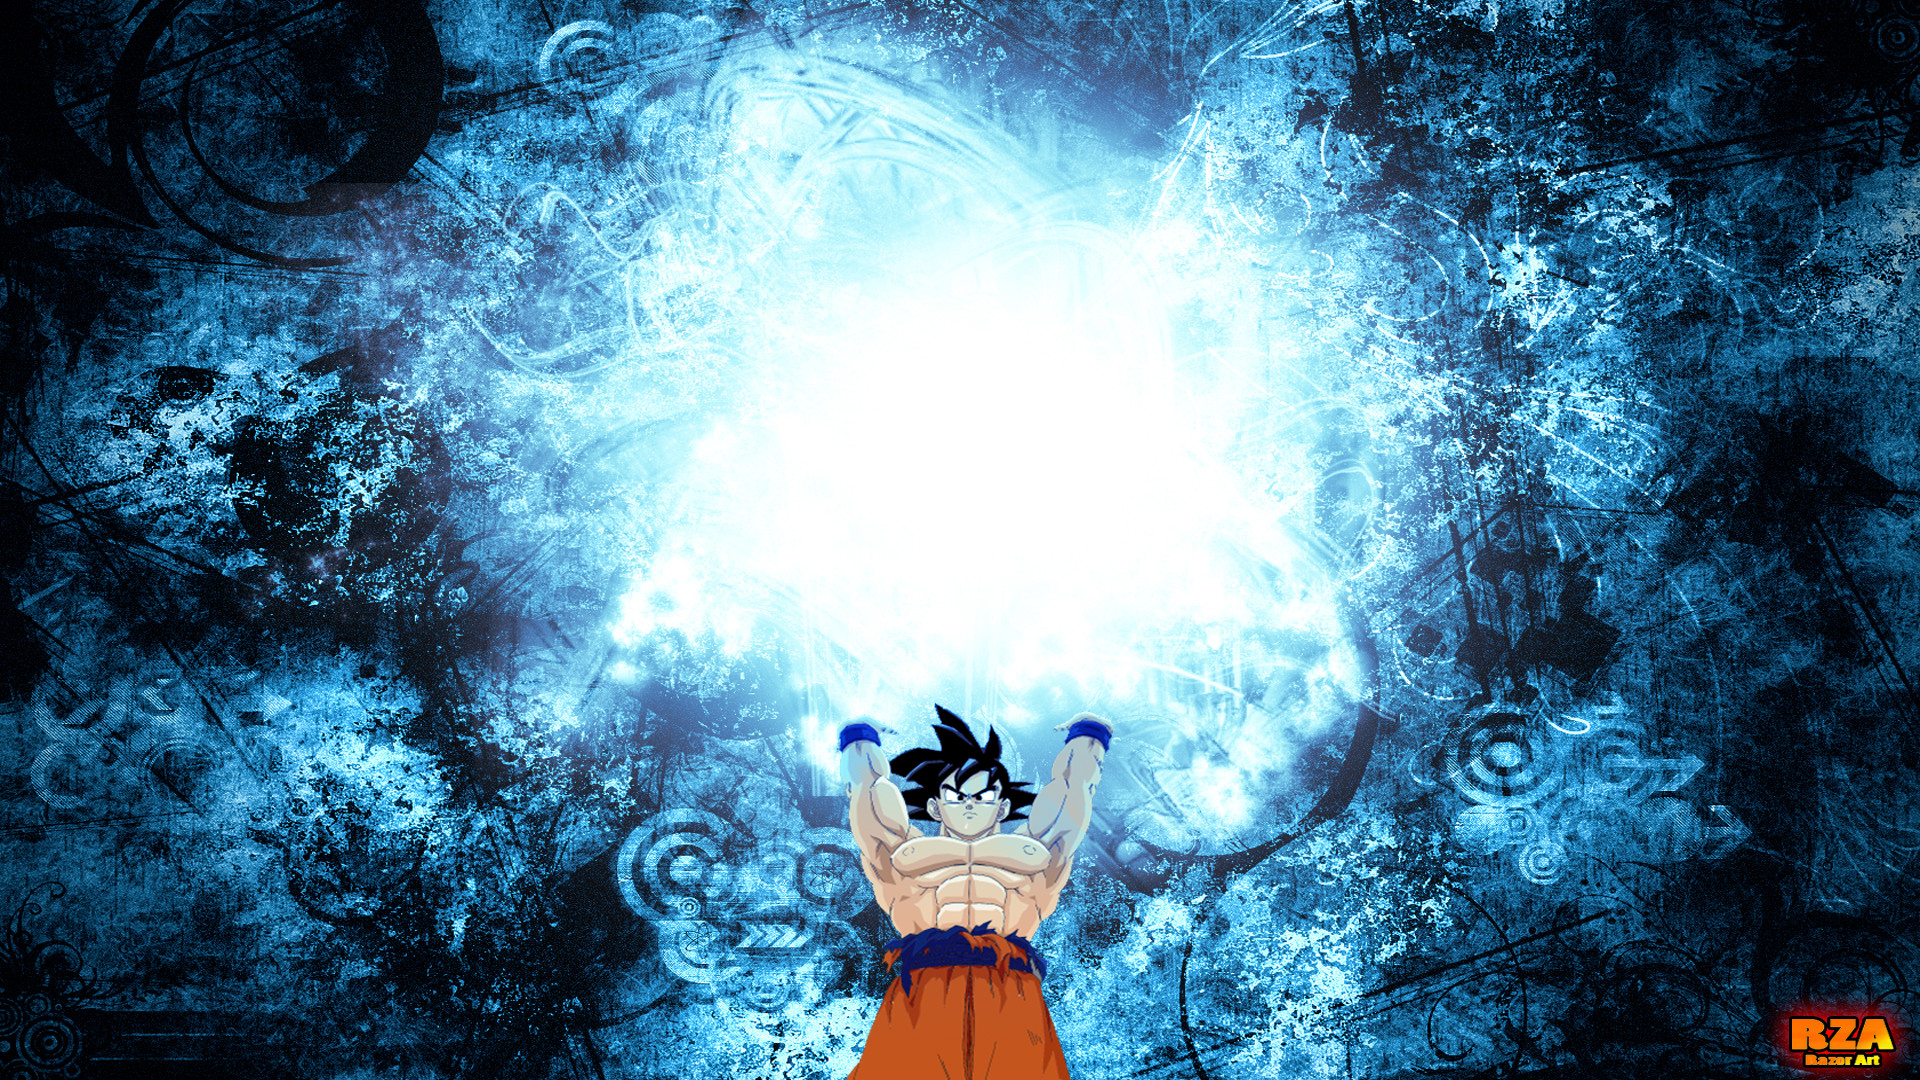 Download Free Goku Dragon Ball Z Photo.